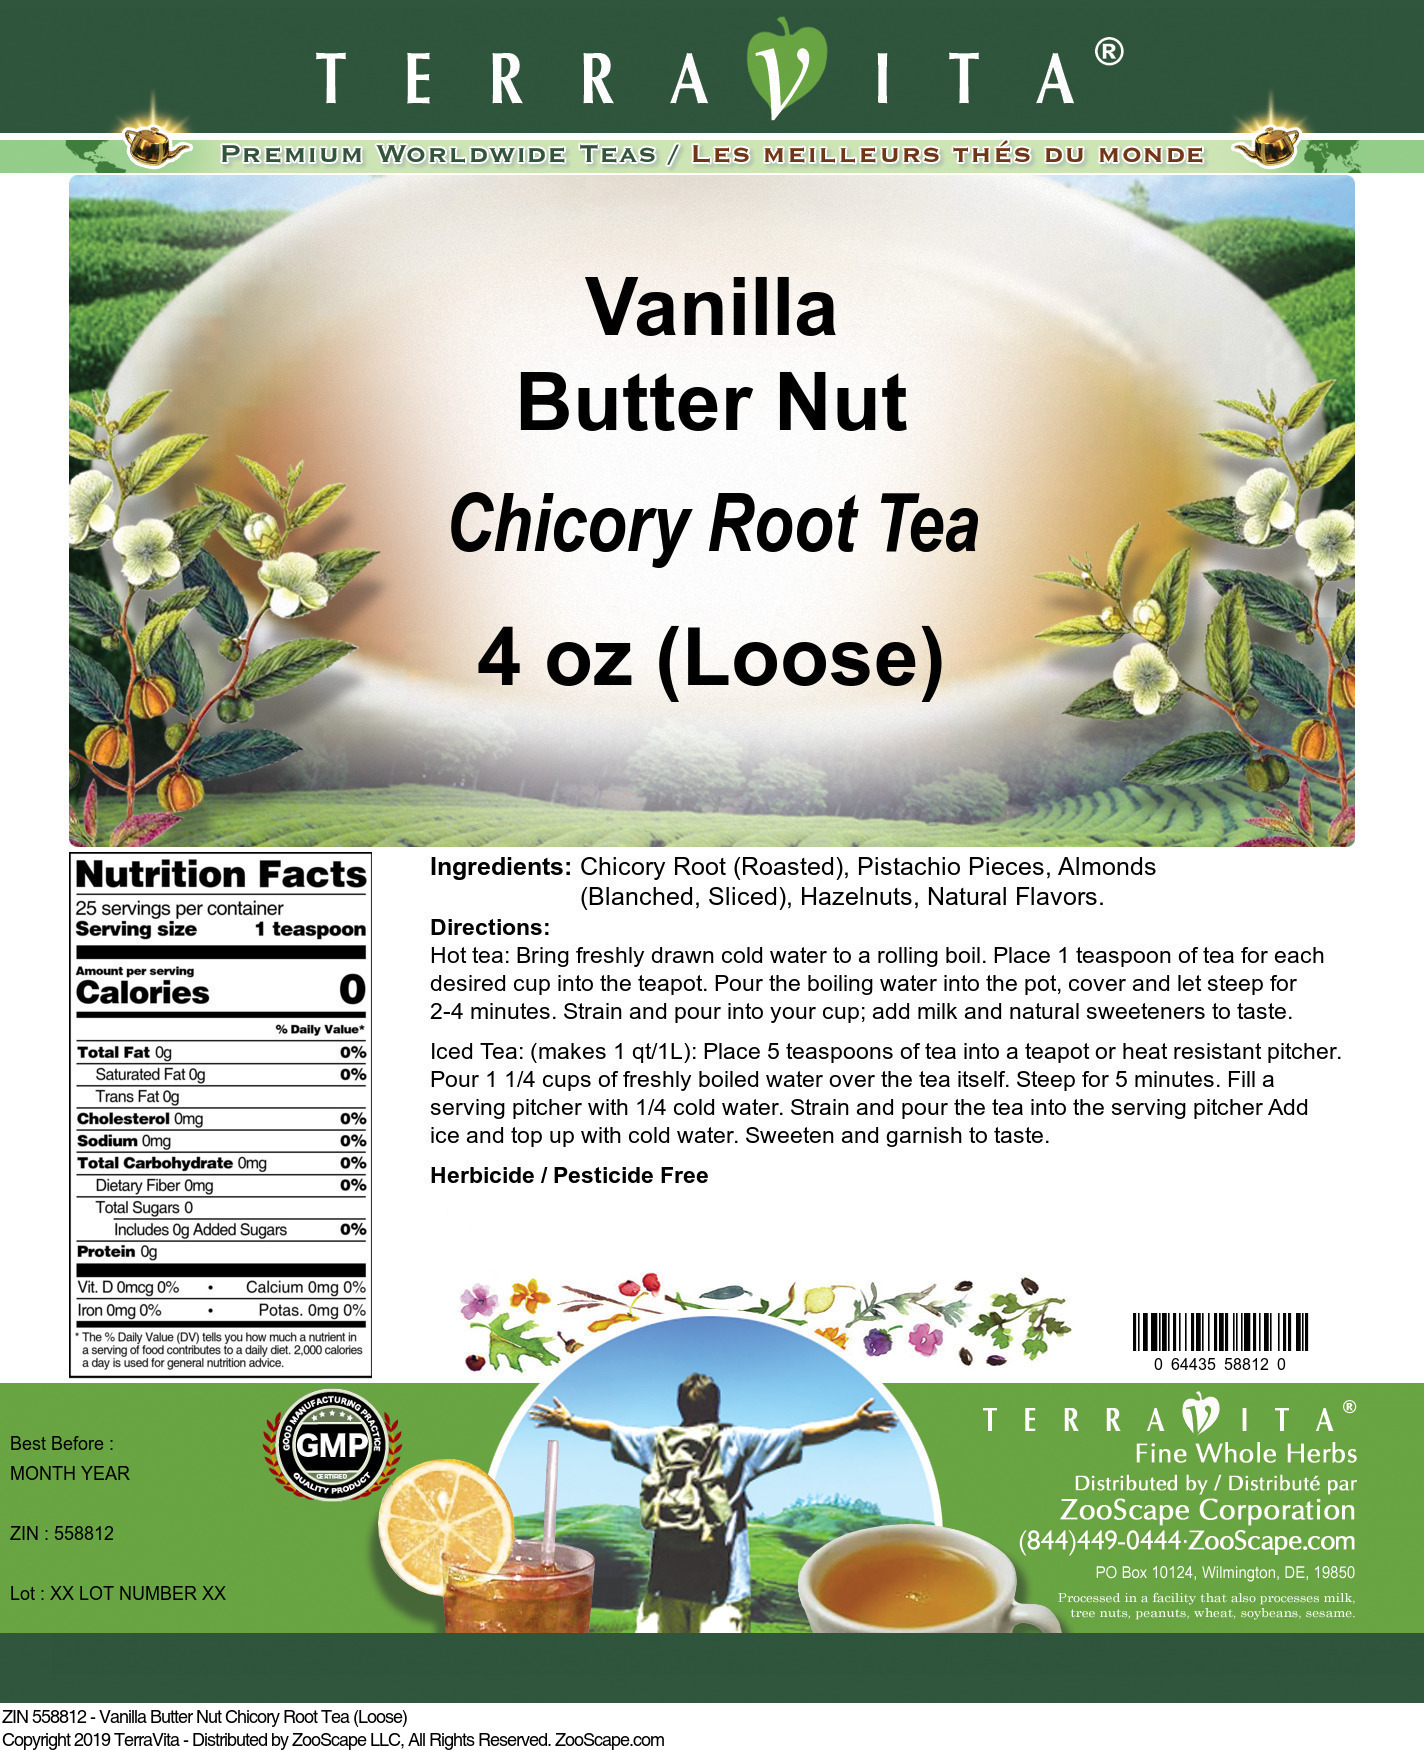 Vanilla Butter Nut Chicory Root Tea (Loose)